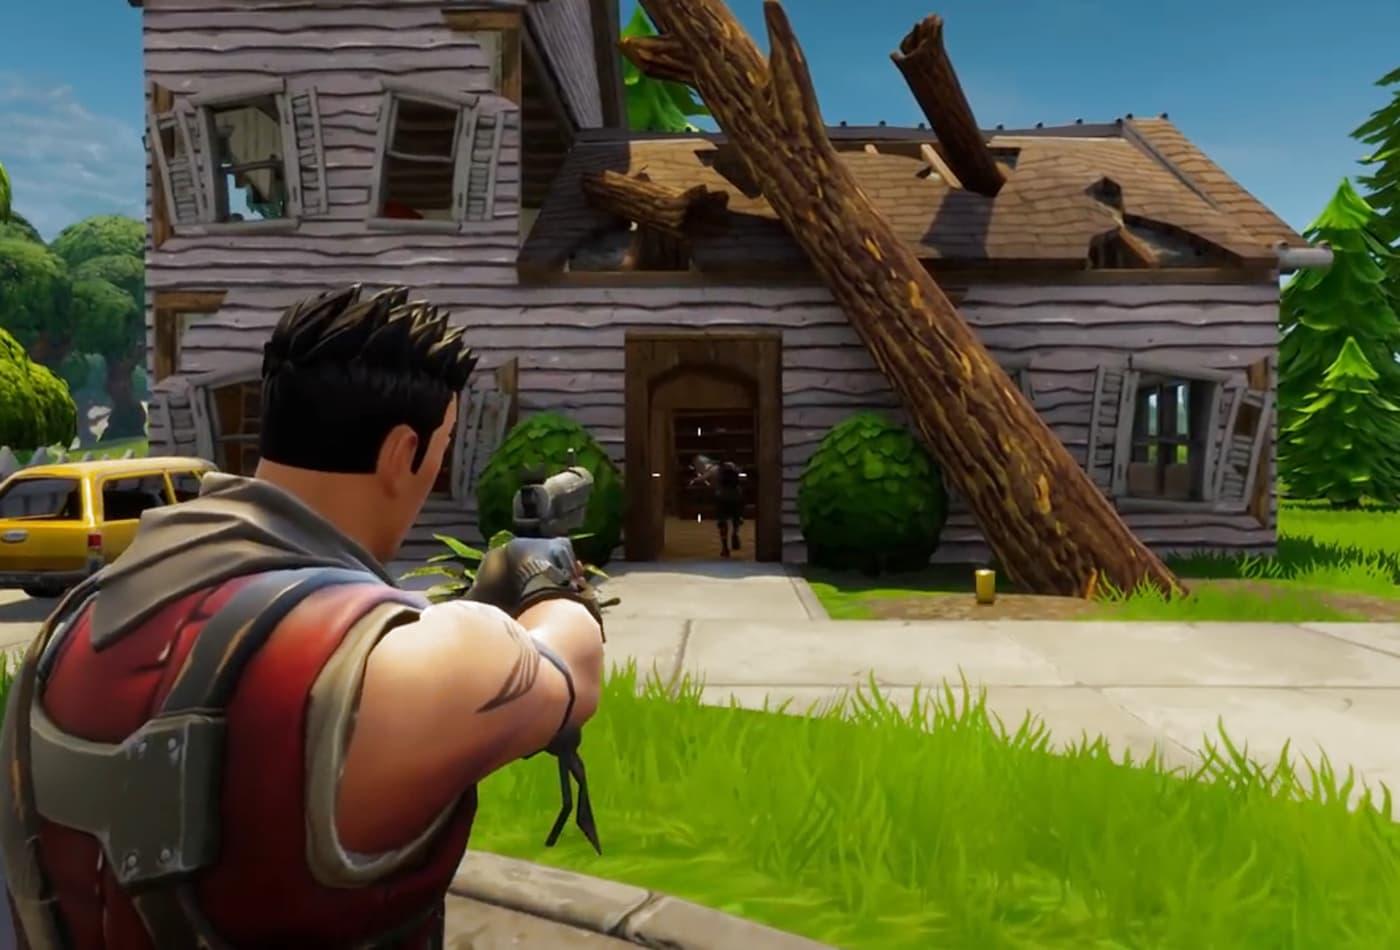 fortnite is celebrating its first birthday video game developer epic - battle royale epic games fortnite